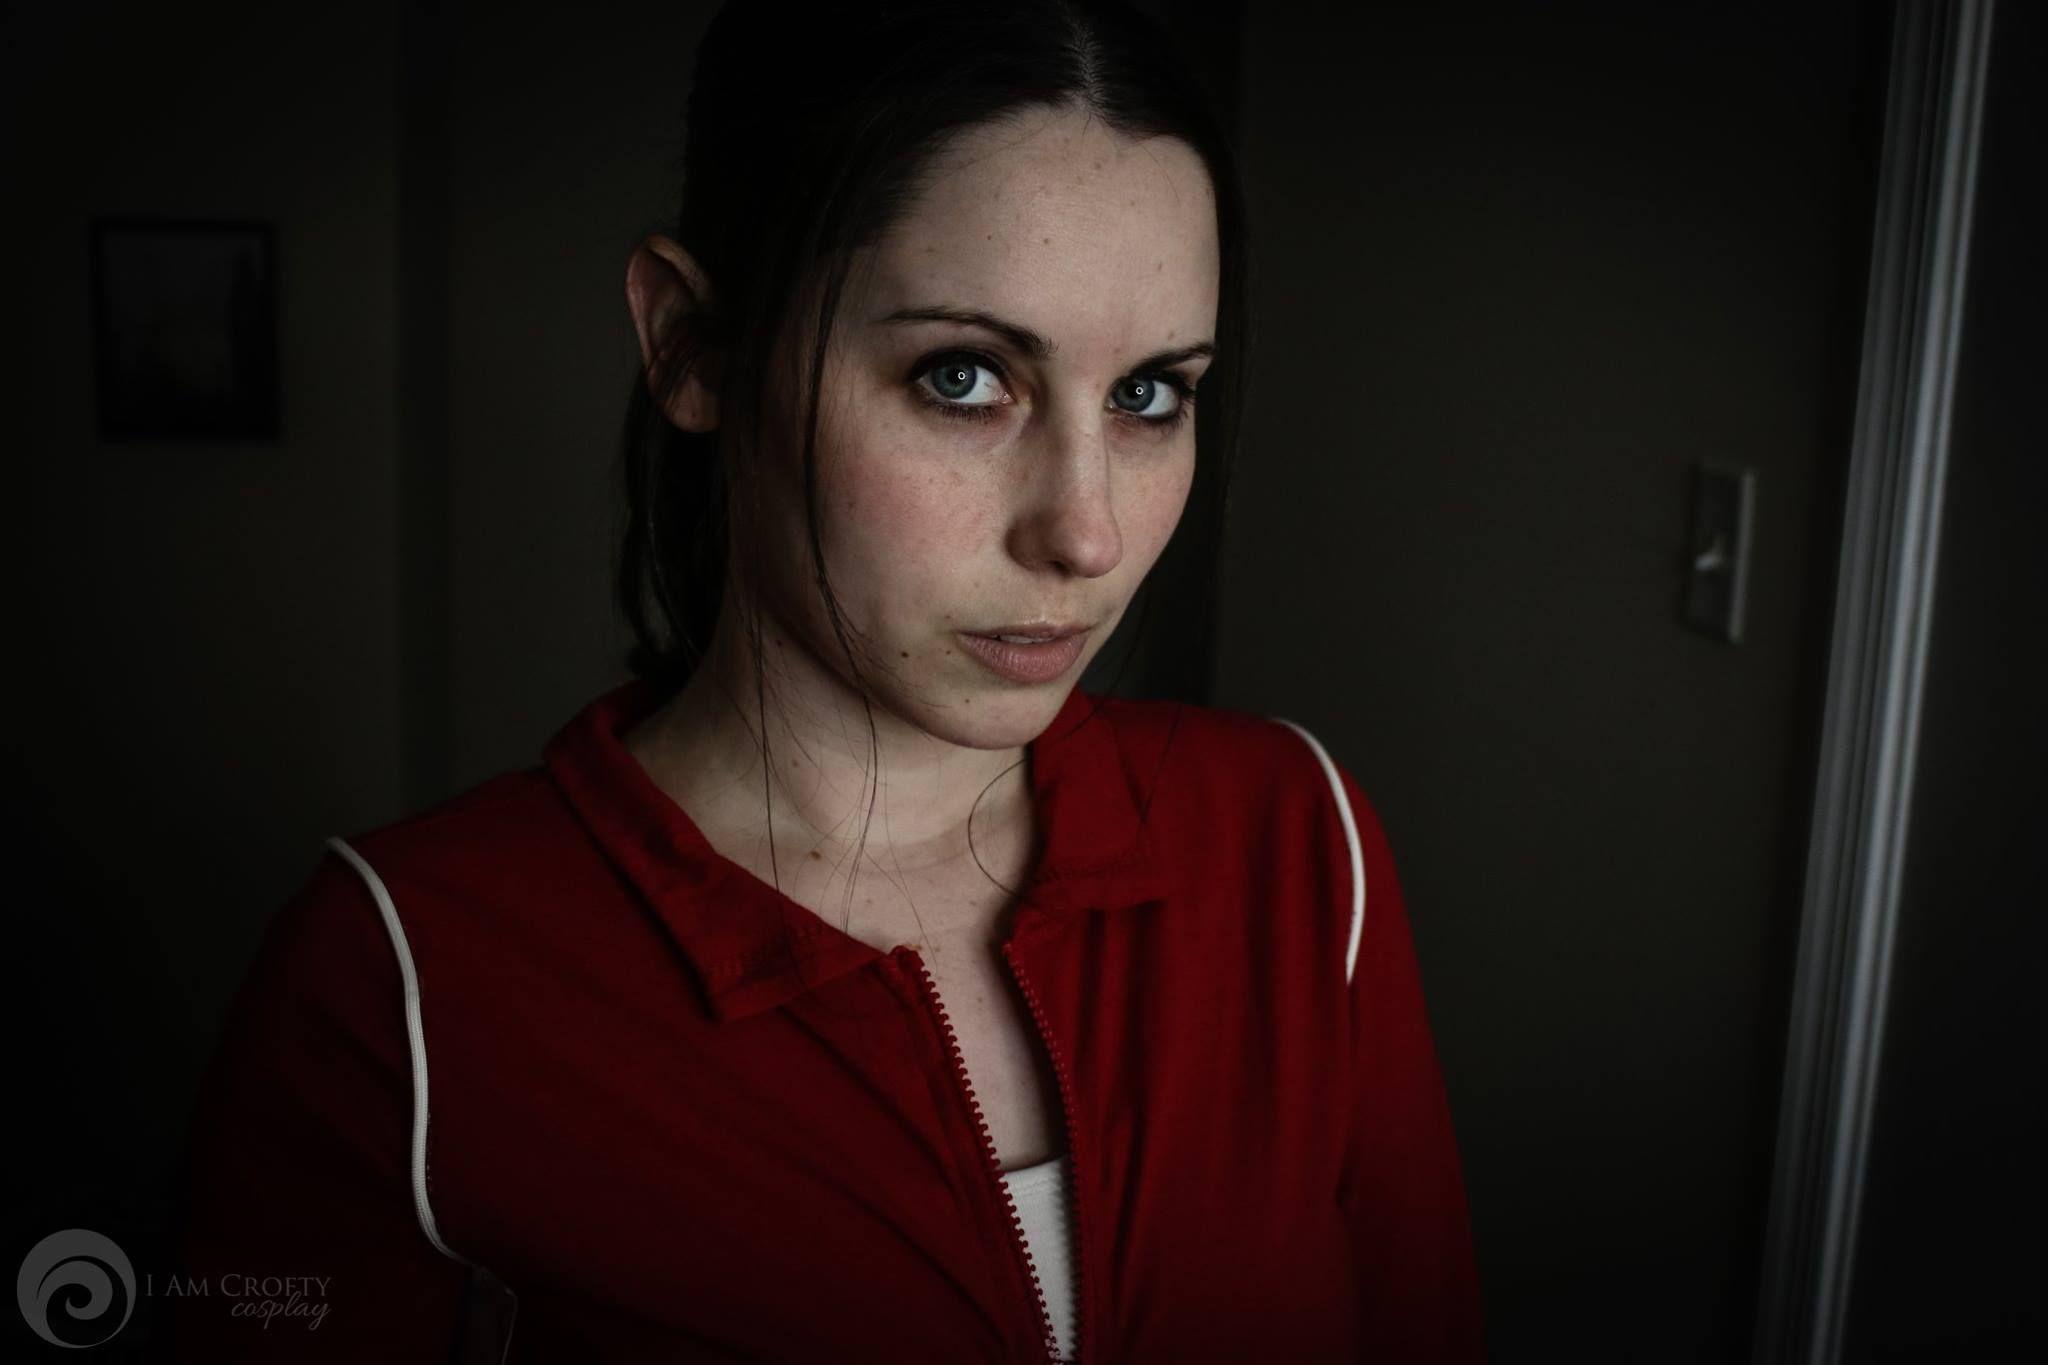 Left 4 Dead: Zoey by MsPepperPotts on DeviantArt